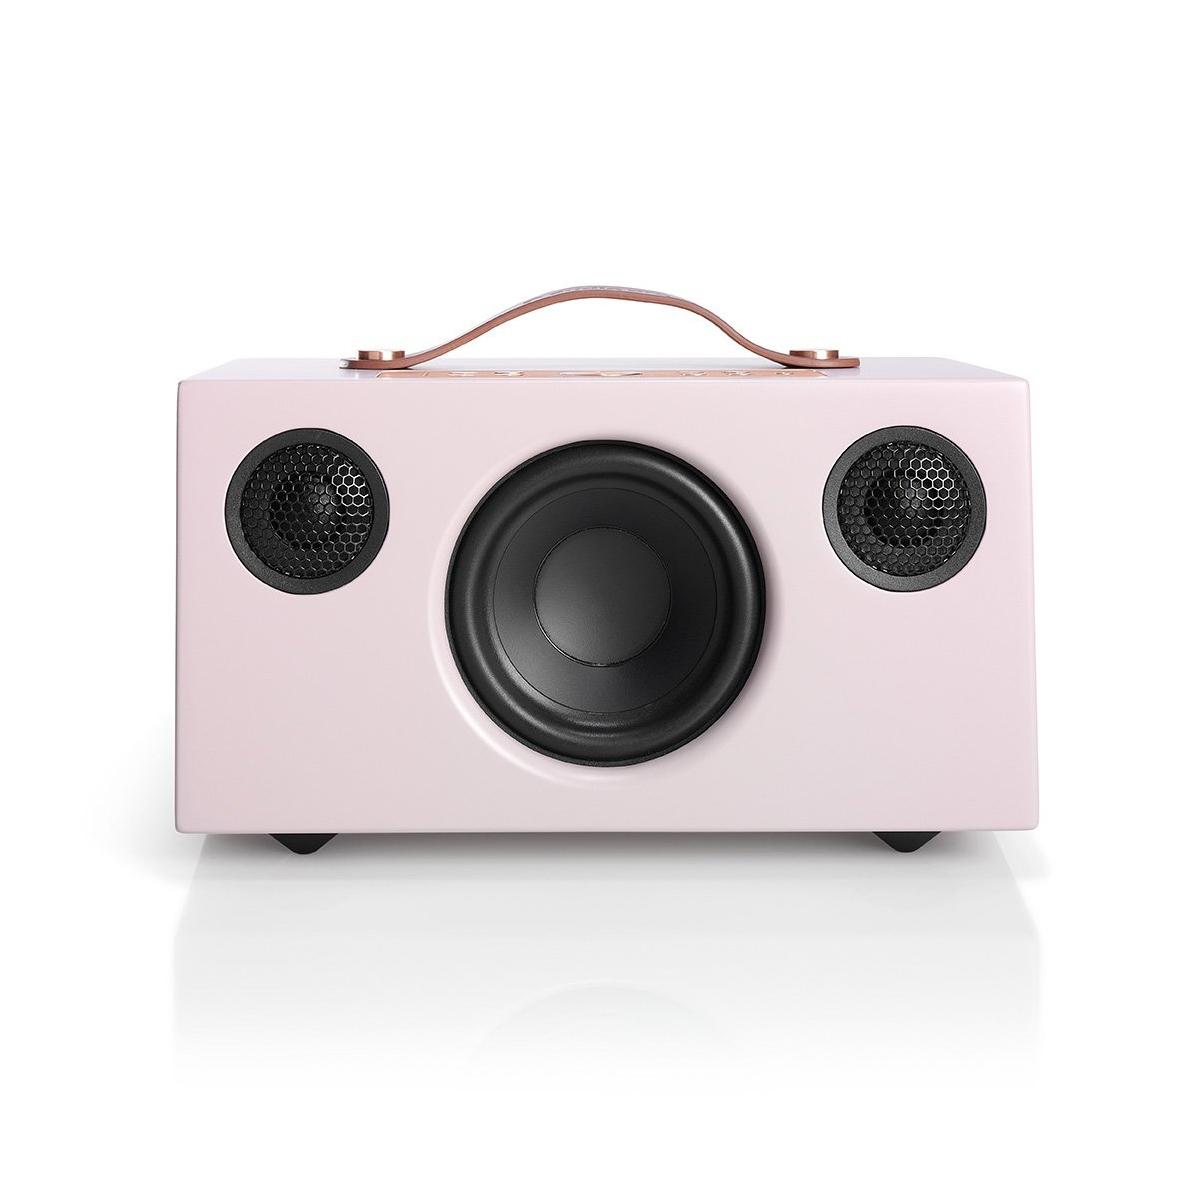 Image of Audio Pro Addon C5 Bluetooth Multiroom Speaker in Pink